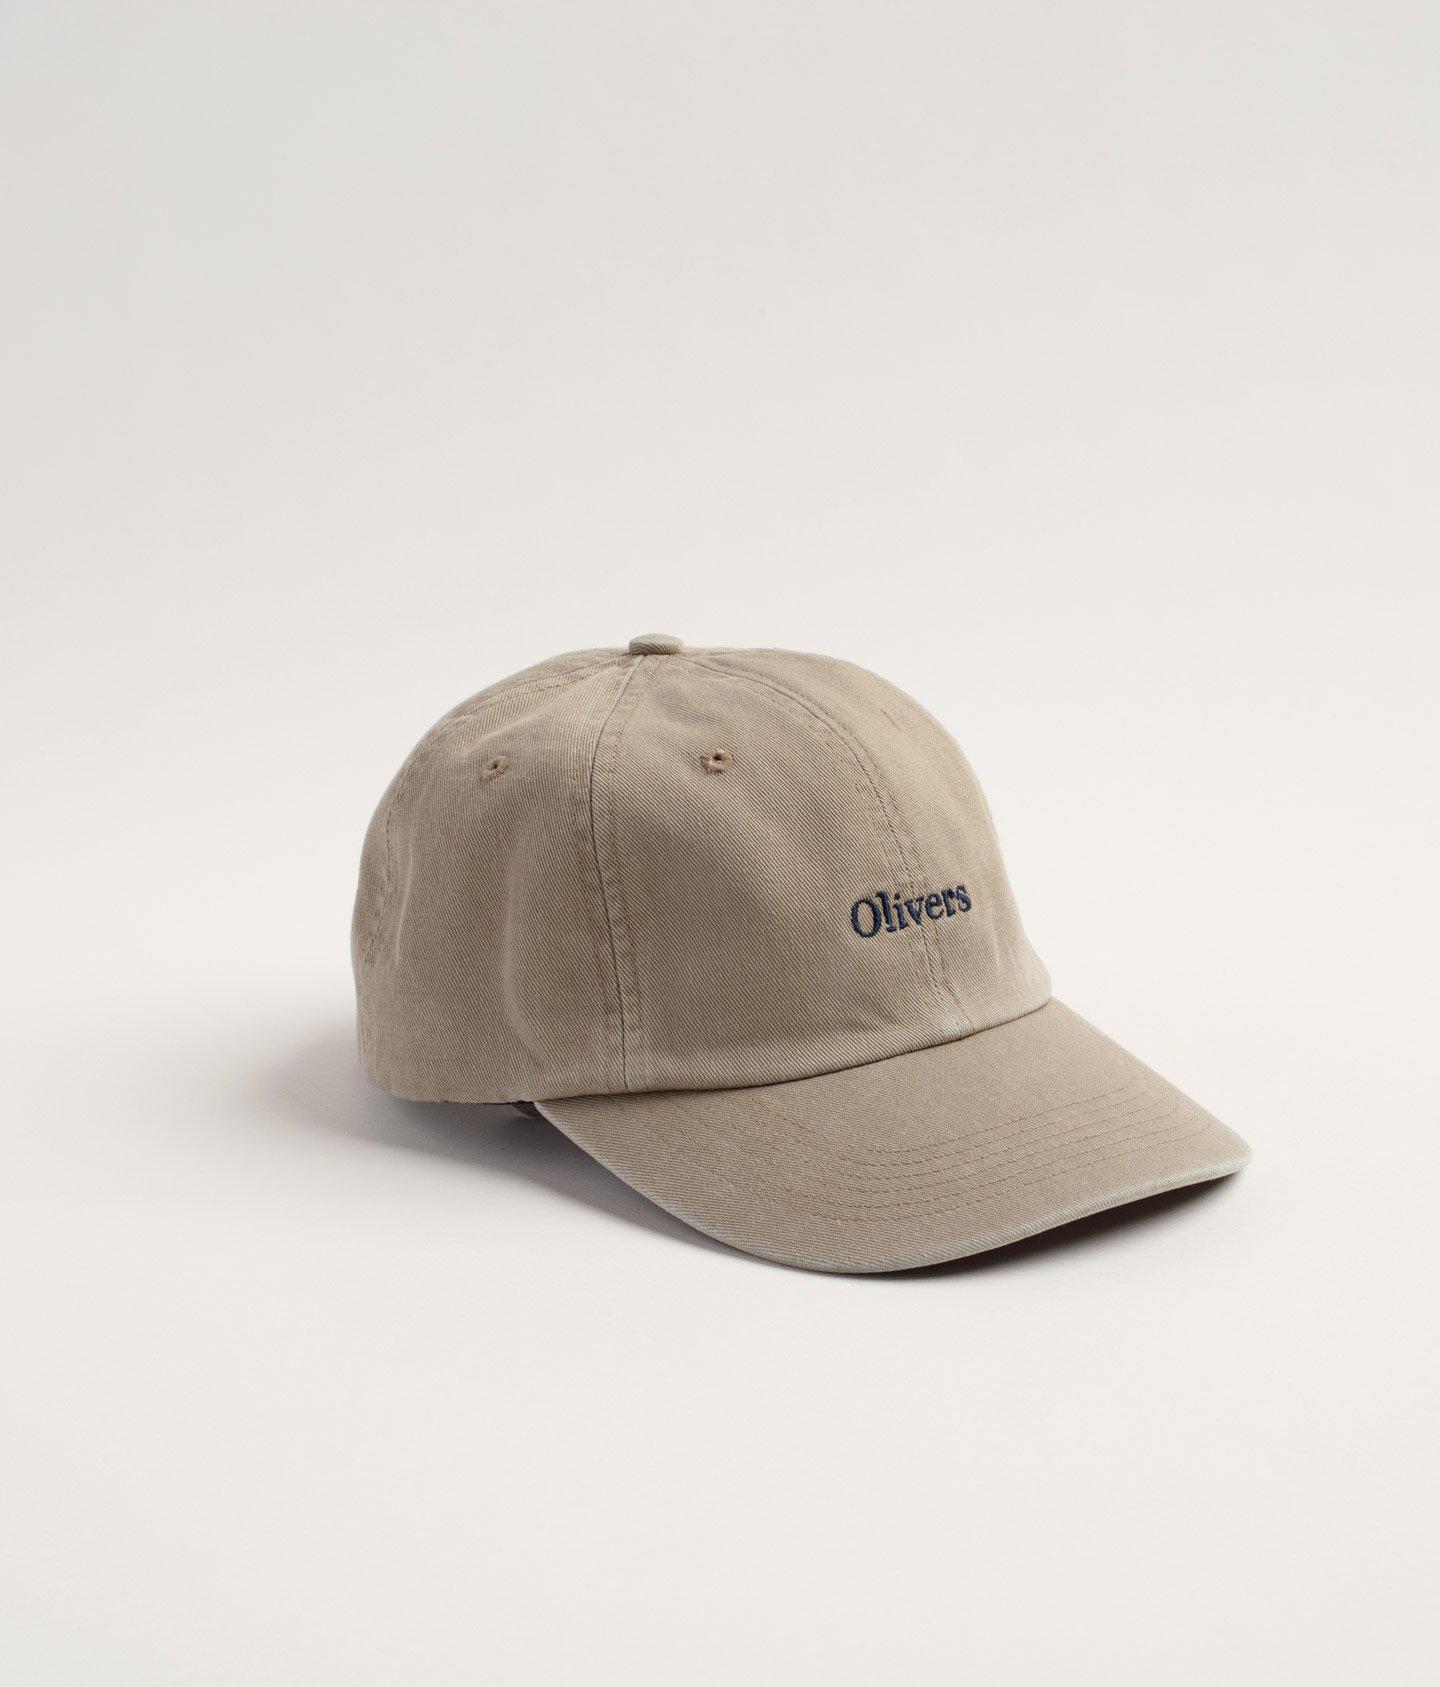 Olivers Field Cap